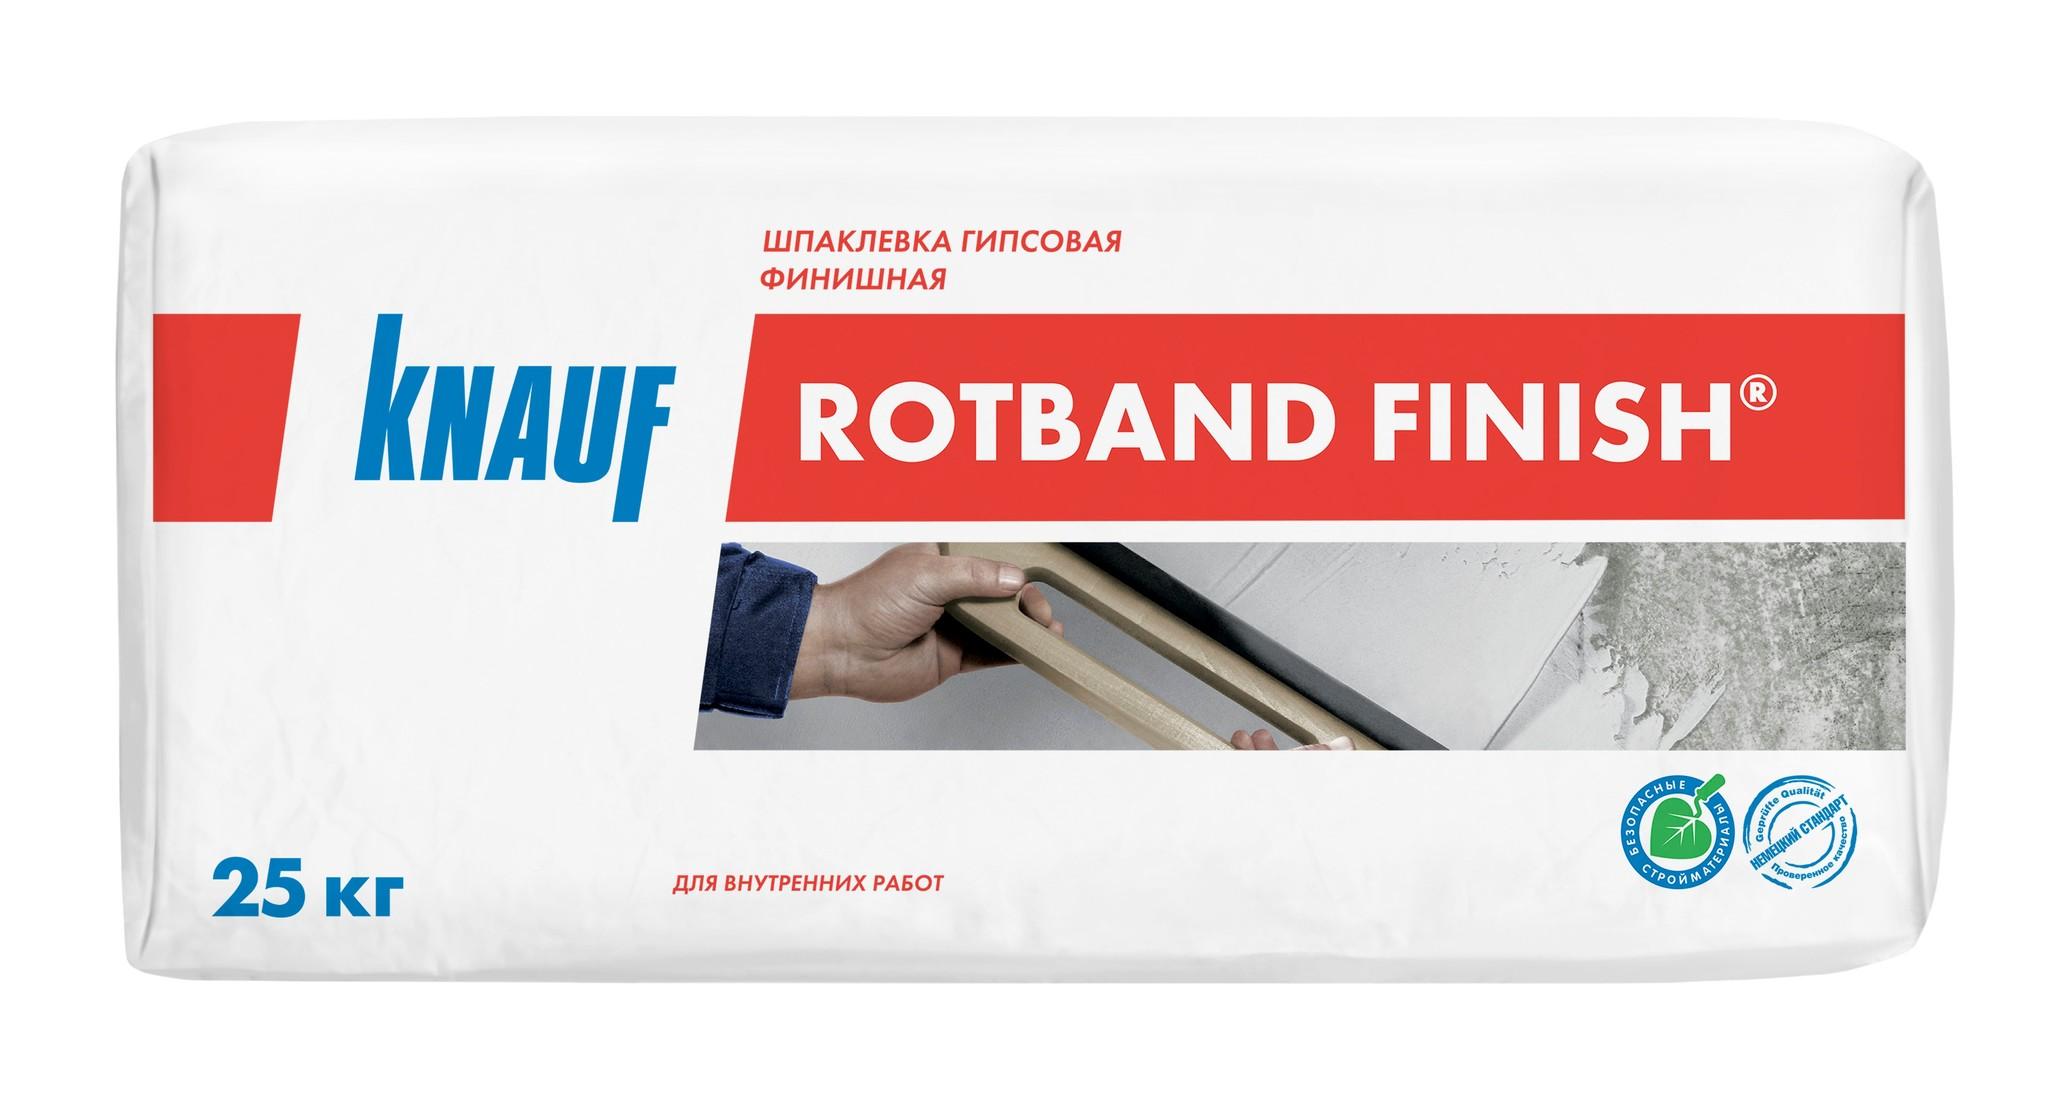 Шпаклевки Шпаклёвка Knauf Ротбанд Финиш гипсовая финишная, 25 кг 58c04247e8454be9a95ac677fdd9cdfa.jpg